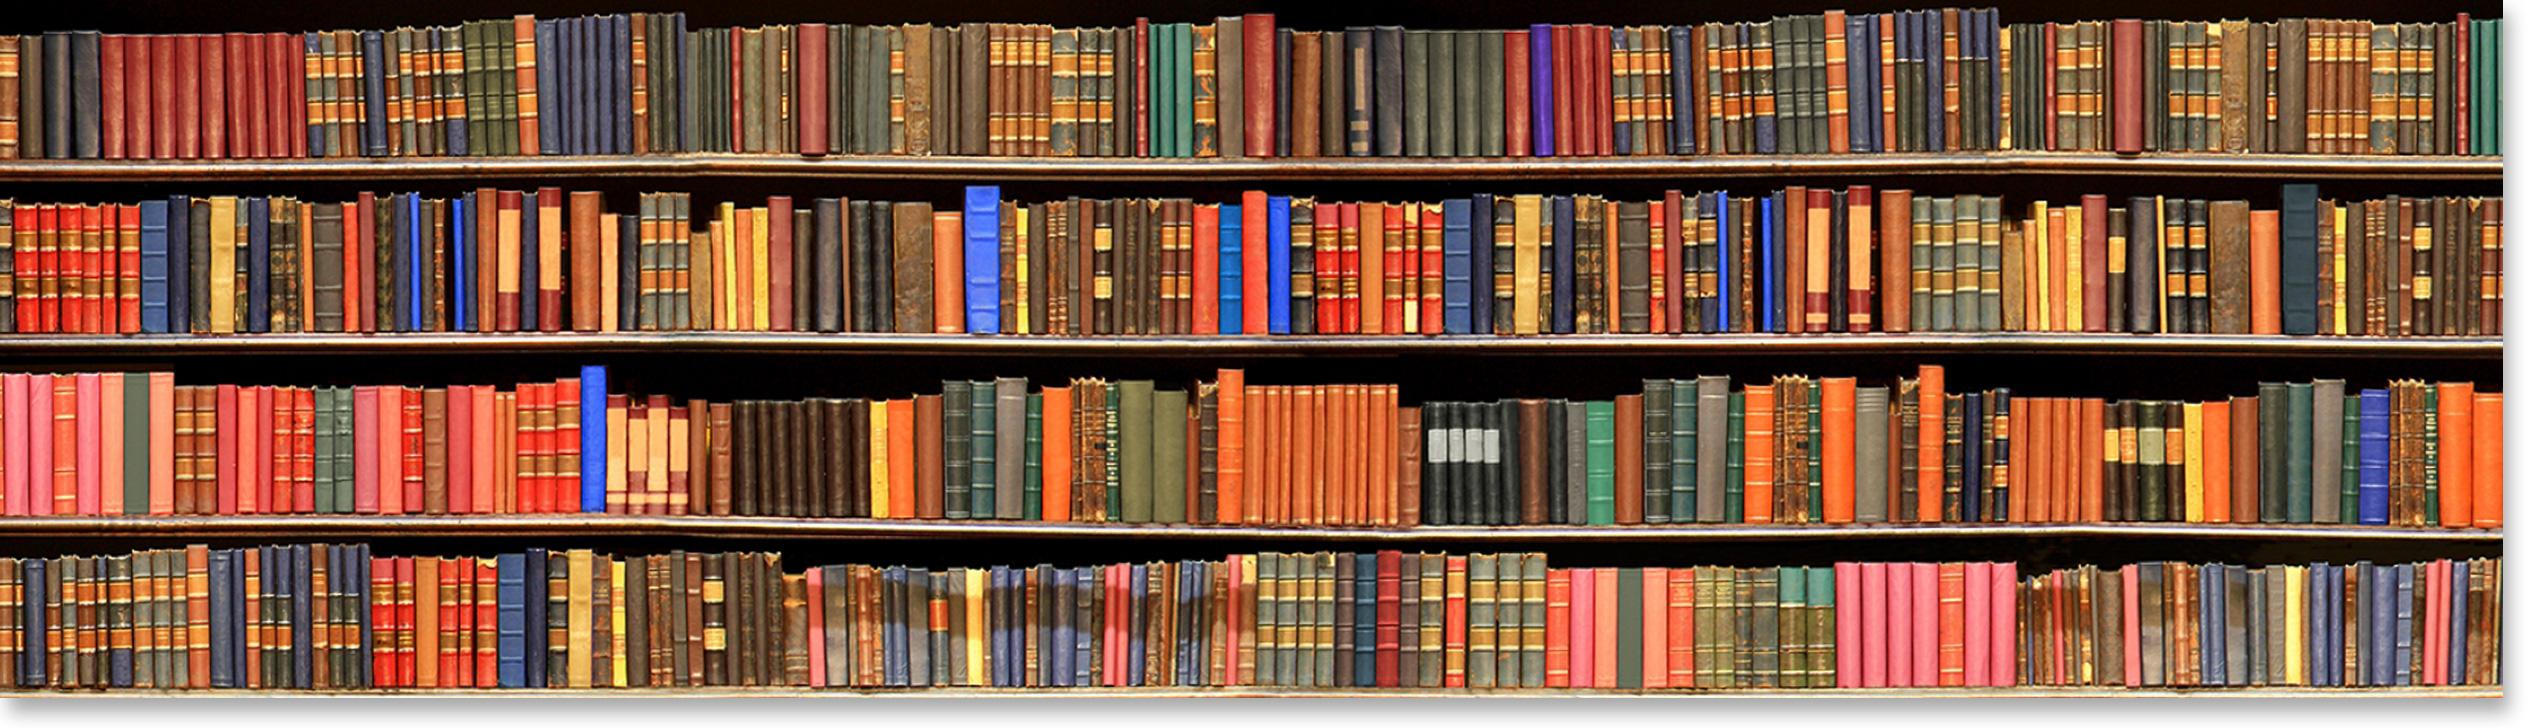 Bücherei bilder  Bücherei - Barlo